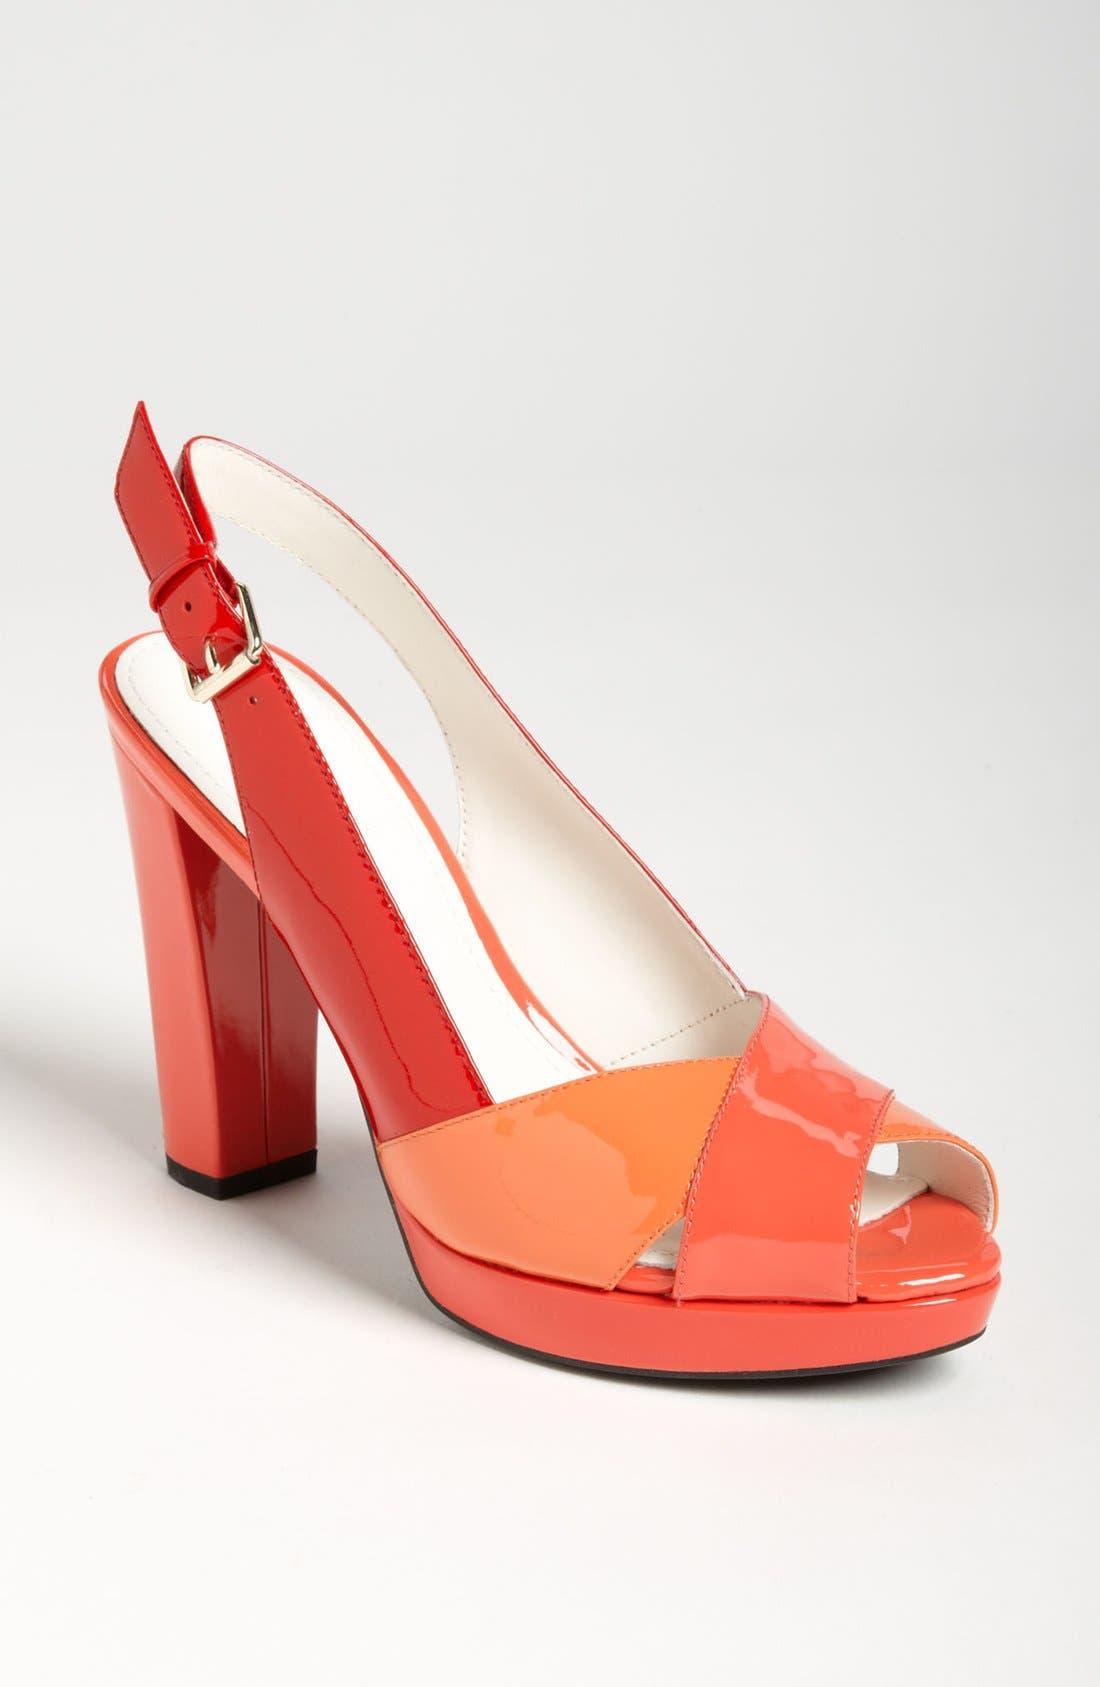 Main Image - Geox 'New Egizia' Slingback Sandal